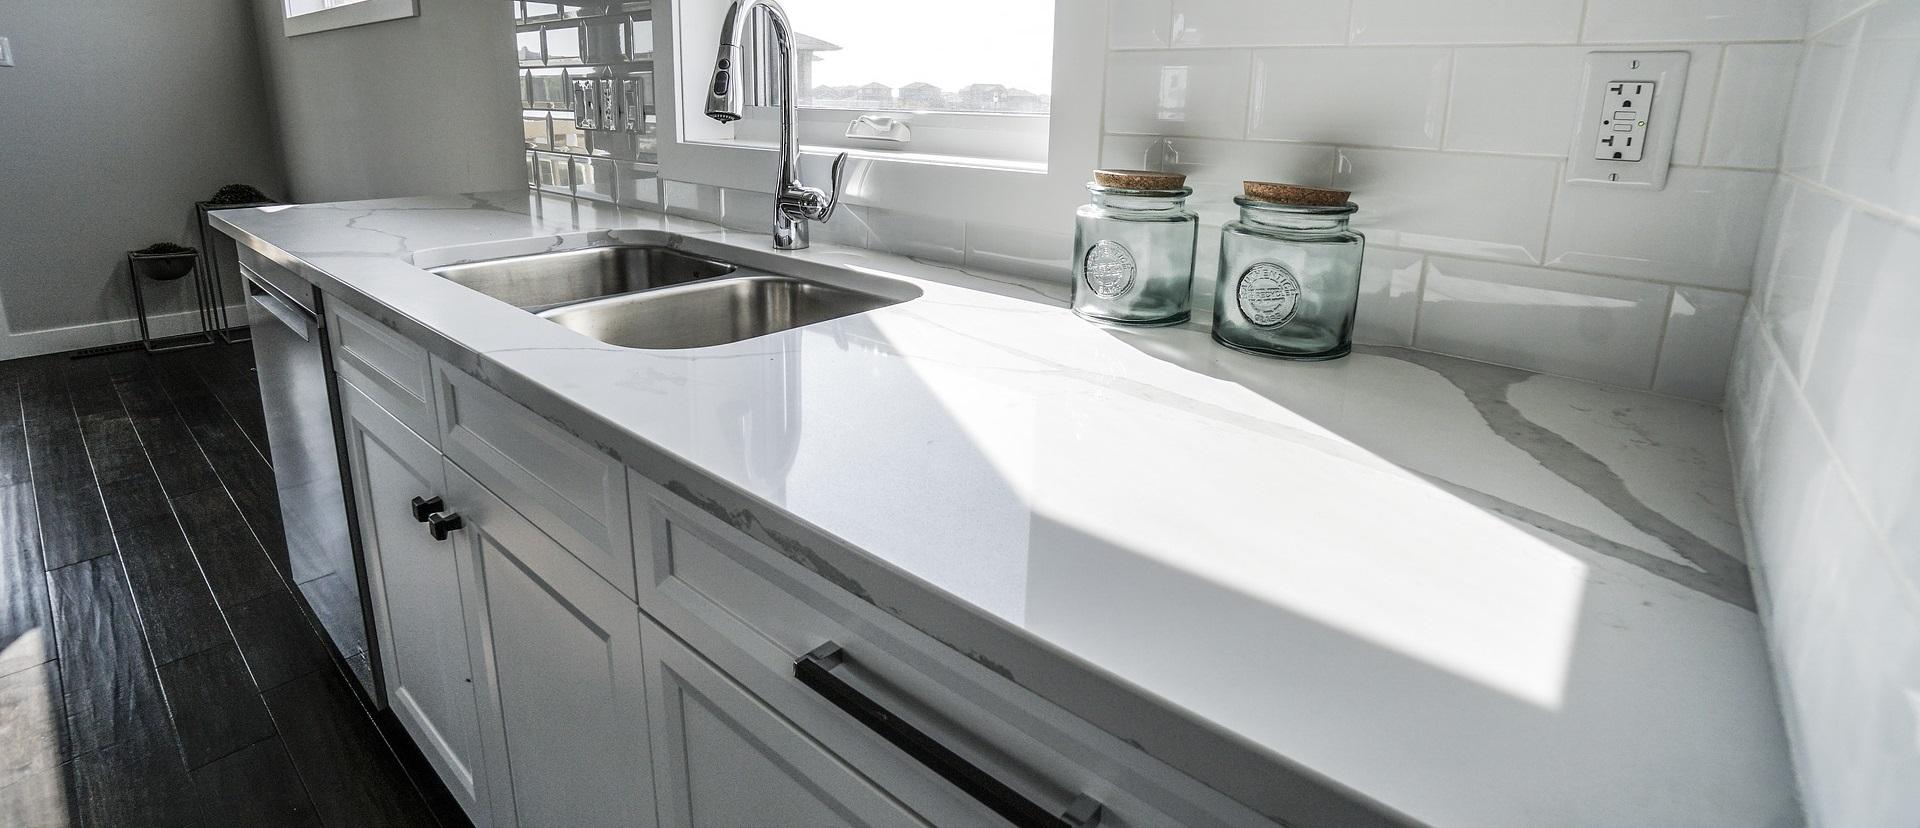 Kitchen countertop resurfacing and custom colors - NuFinishPro